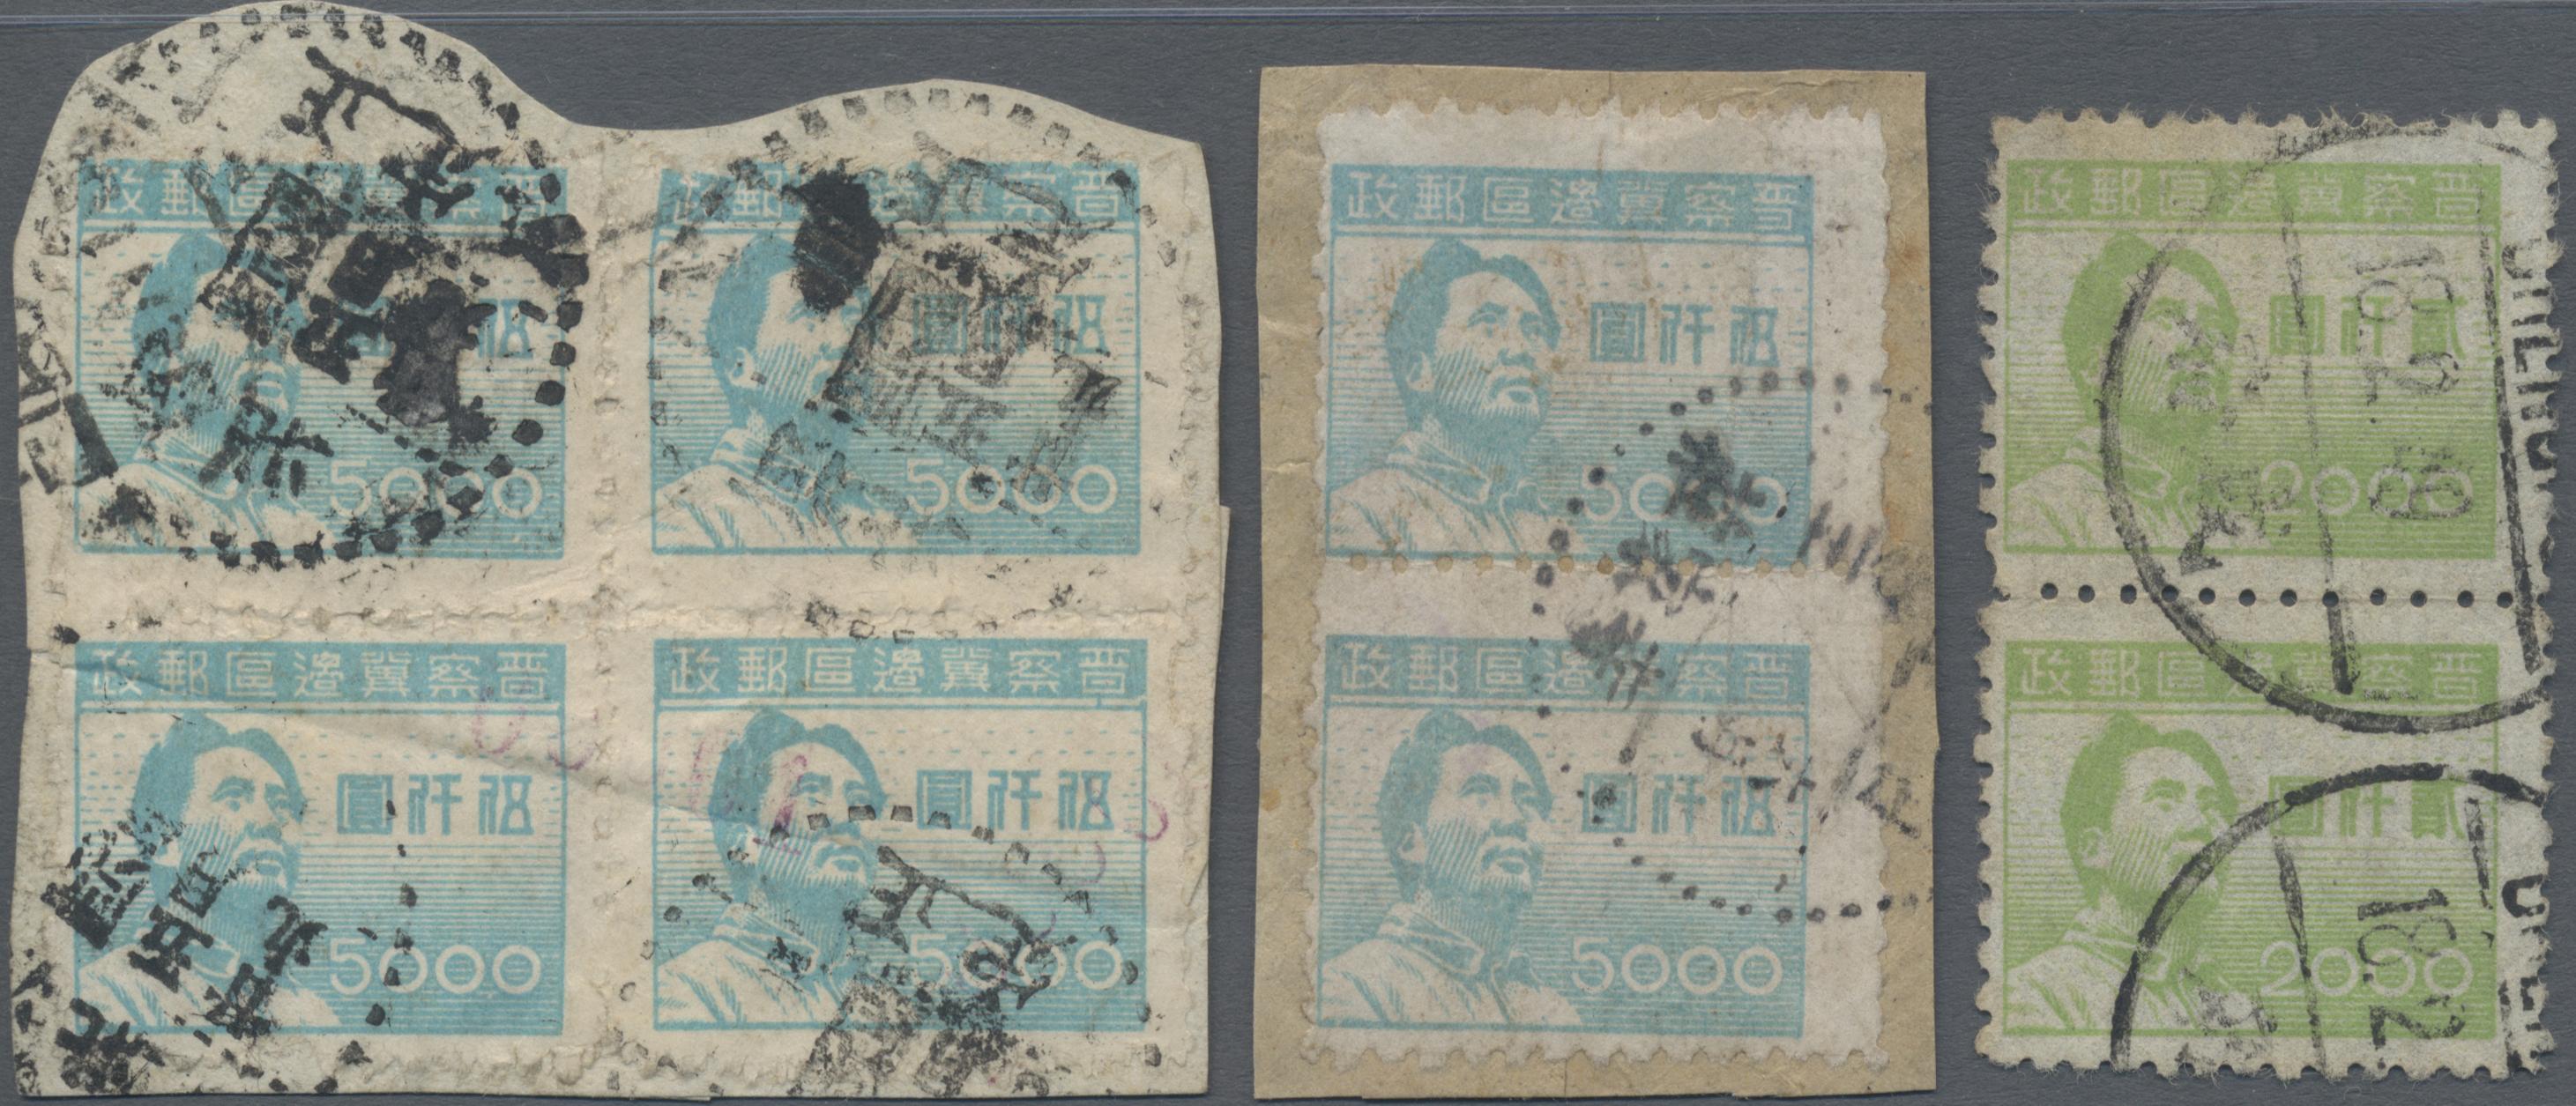 Lot 05509 - China - Volksrepublik - Provinzen  -  Auktionshaus Christoph Gärtner GmbH & Co. KG Sale #45- Special Auction China